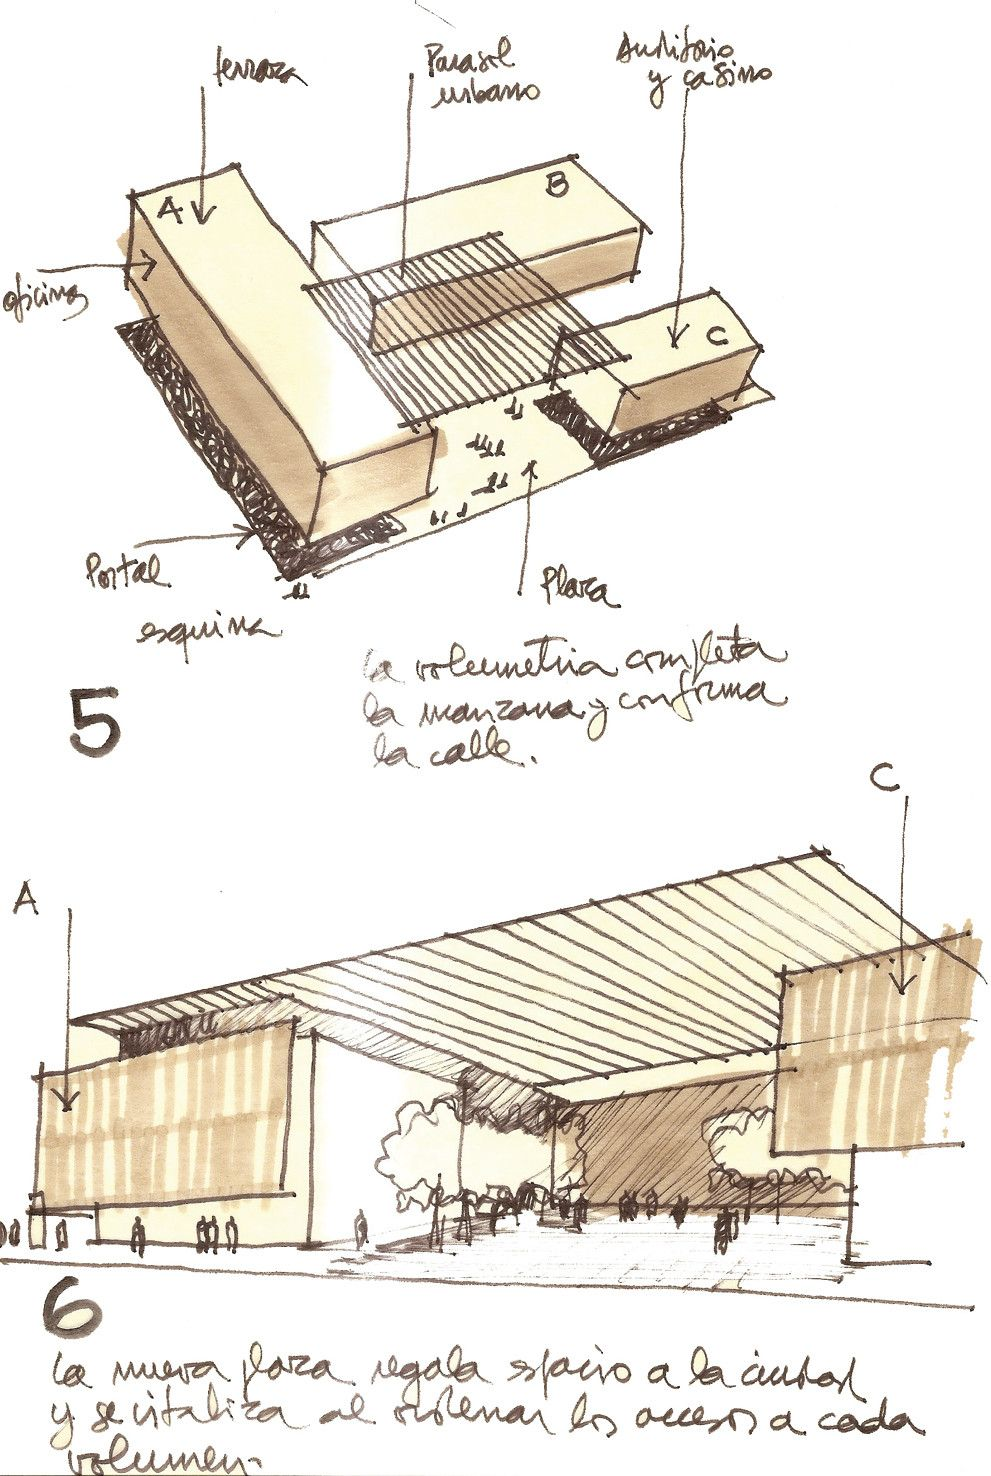 Galer a de edificio mop rancagua iglesis prat for Raumgestaltung chinesisch